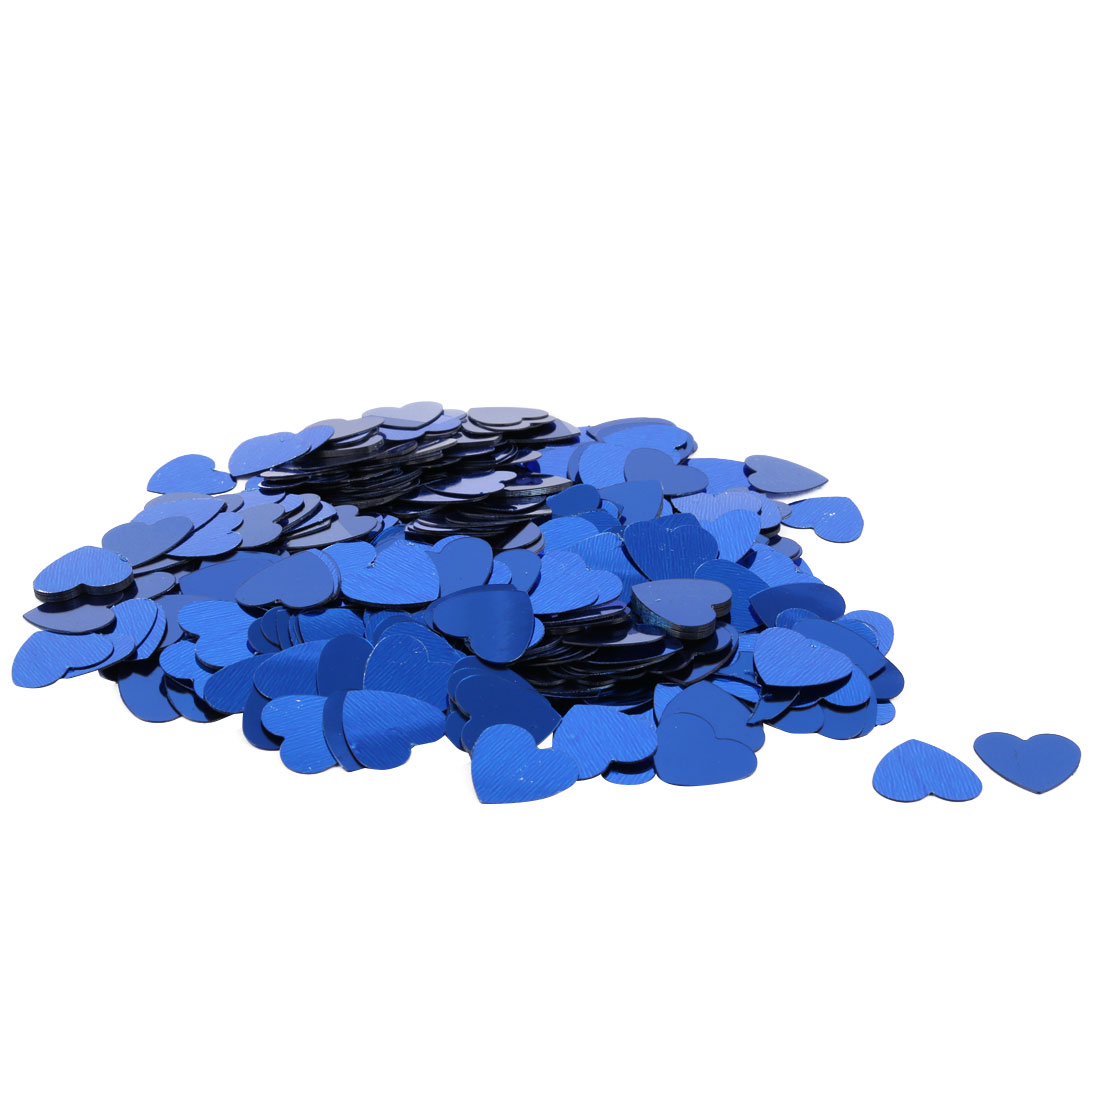 Wedding Party Plastic Heart Shaped Romance DIY Crystal Table Decor Blue 500 Pcs